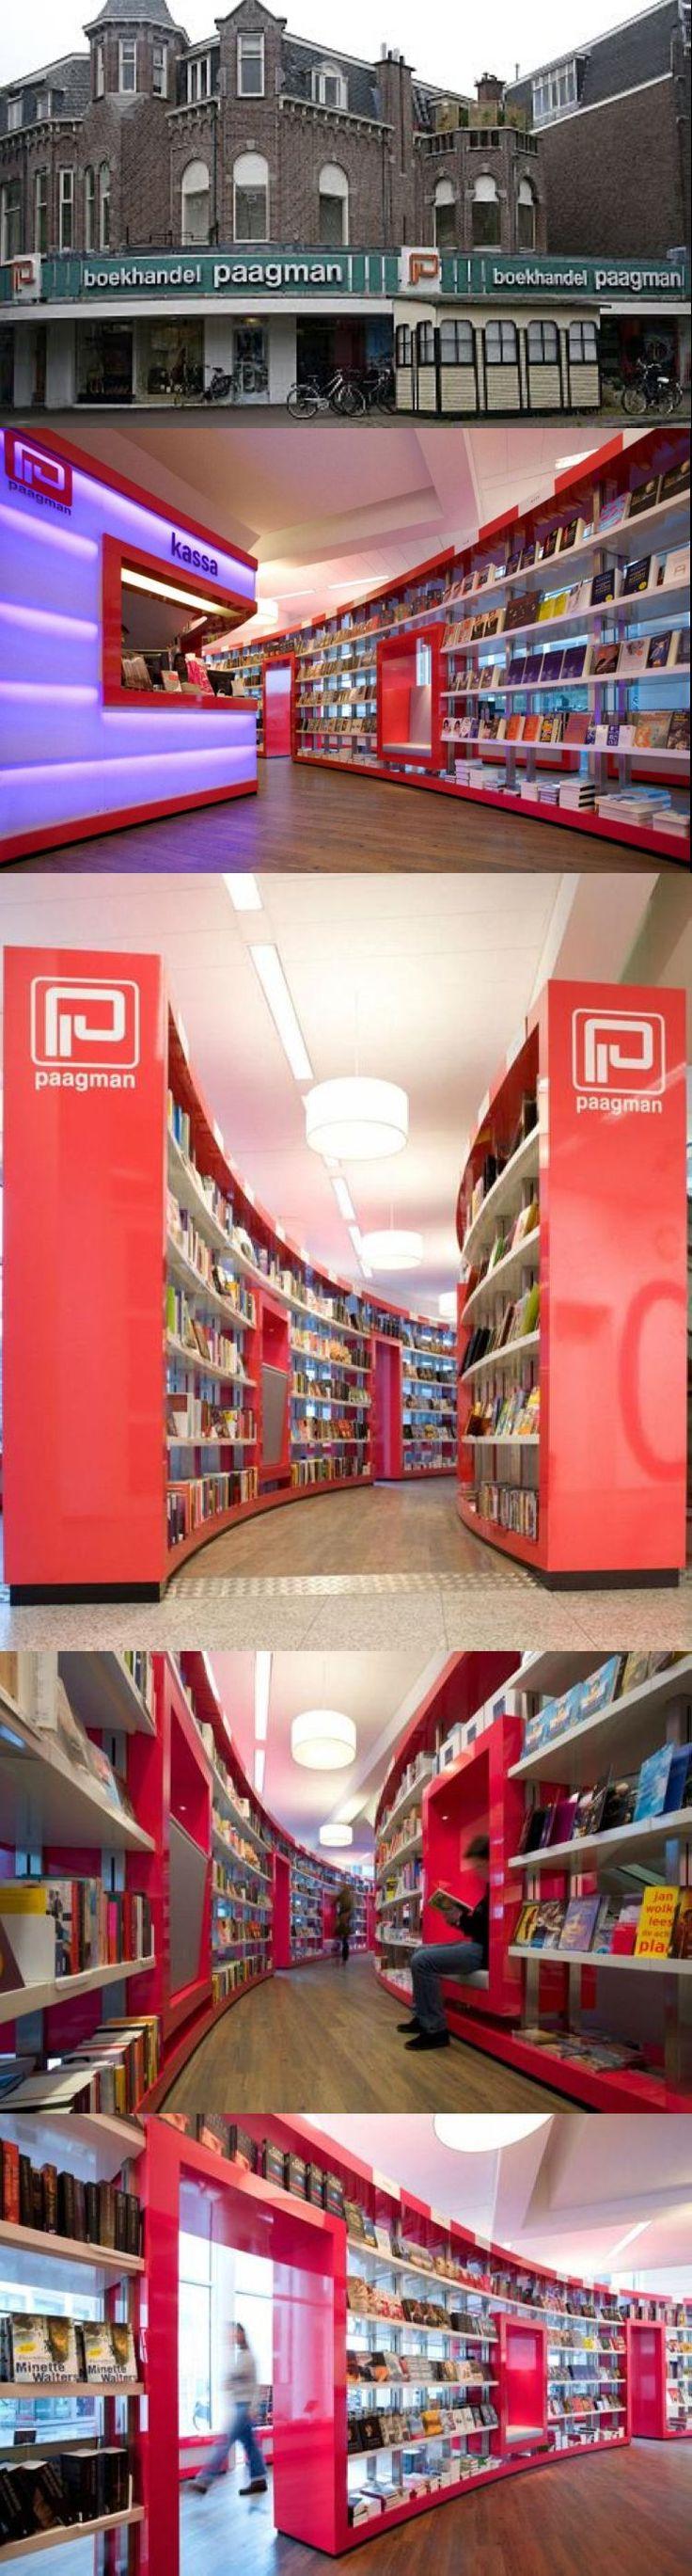 Bookstore - Paagman, Hague, Netherlands